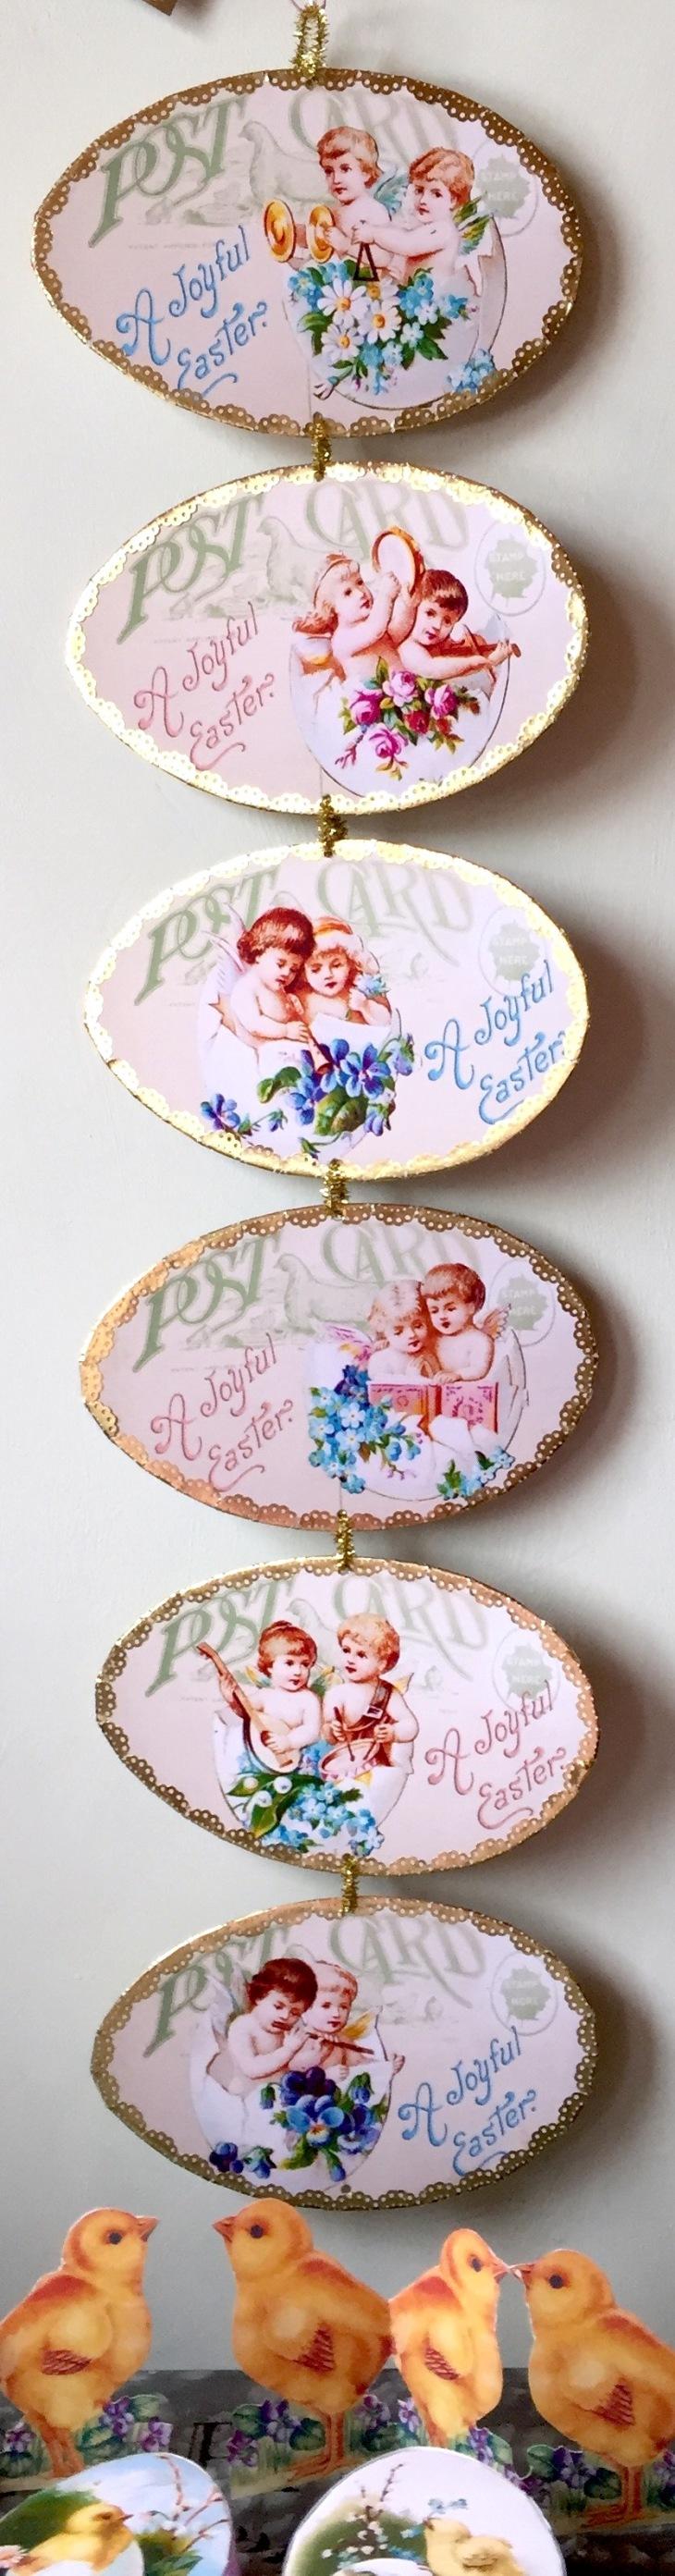 Wings of Whimsy: Cherub Eggs No1-3 #vintage #ephemera #freebie #printable #easter #cherubs #eggs